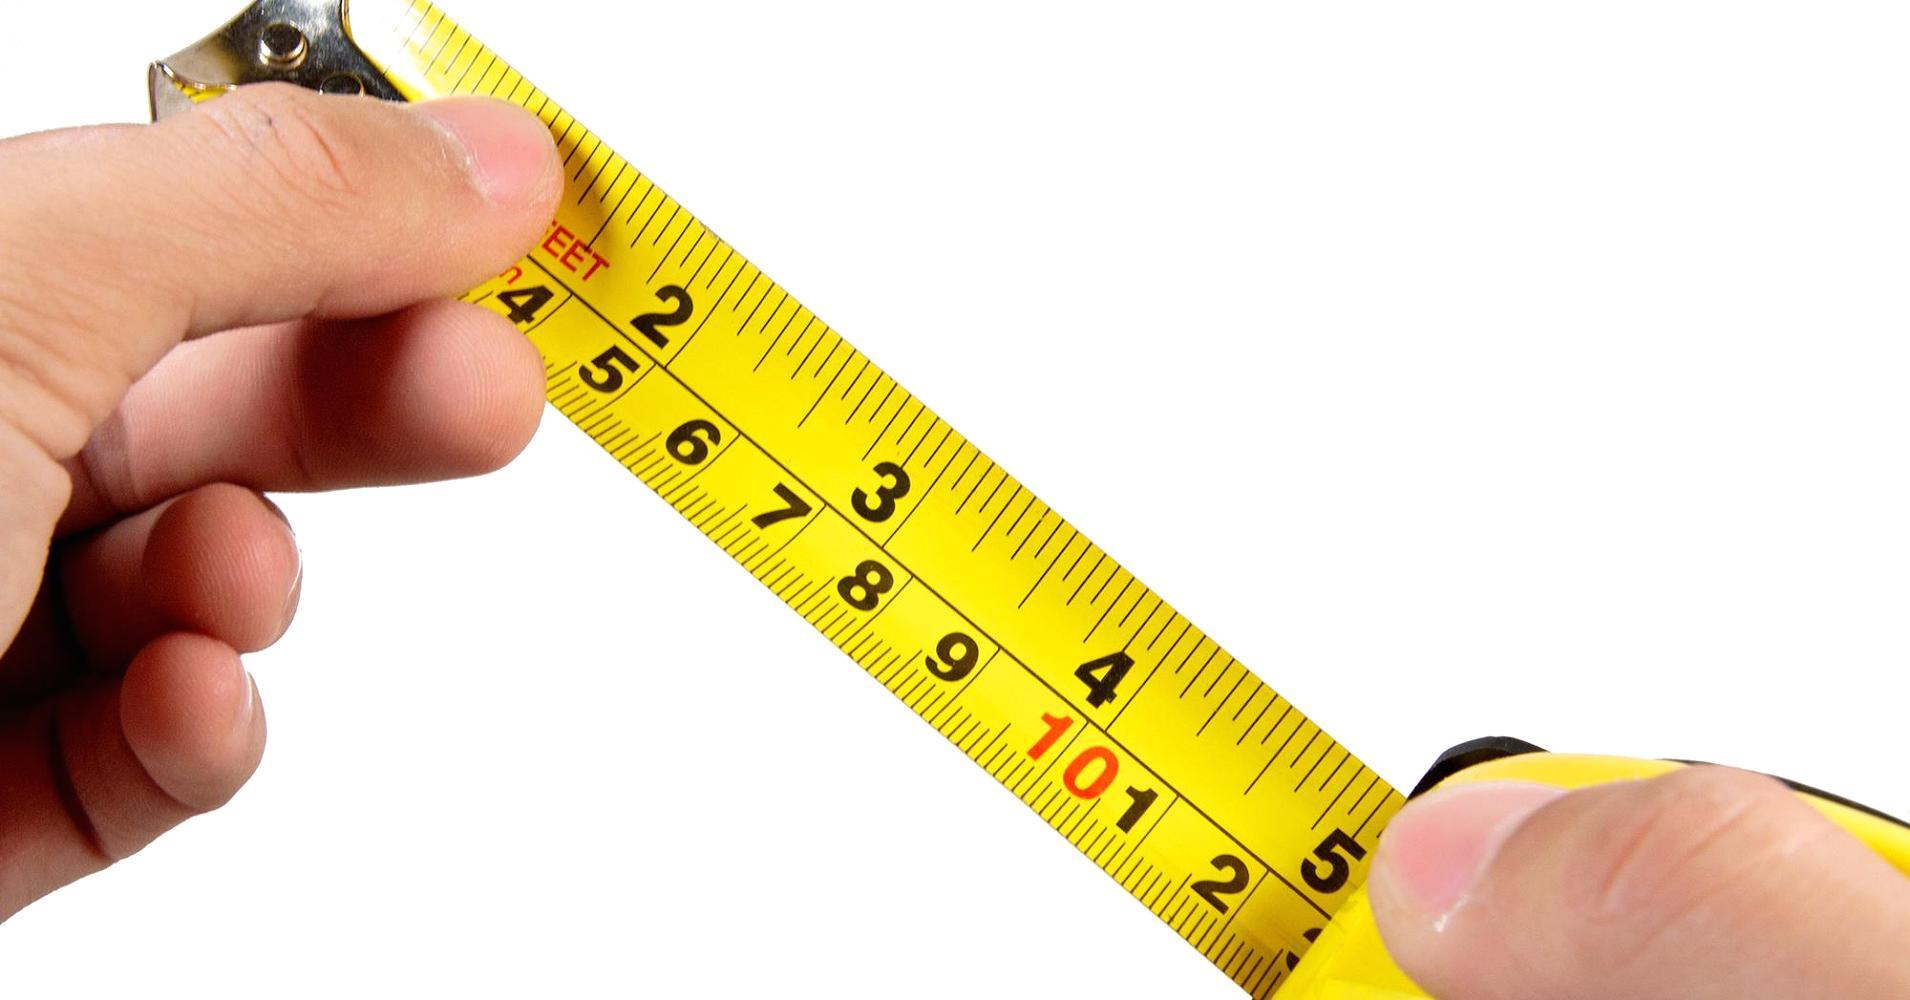 Penis-Size Study Am I Normal? Reveals Average Manhood Length